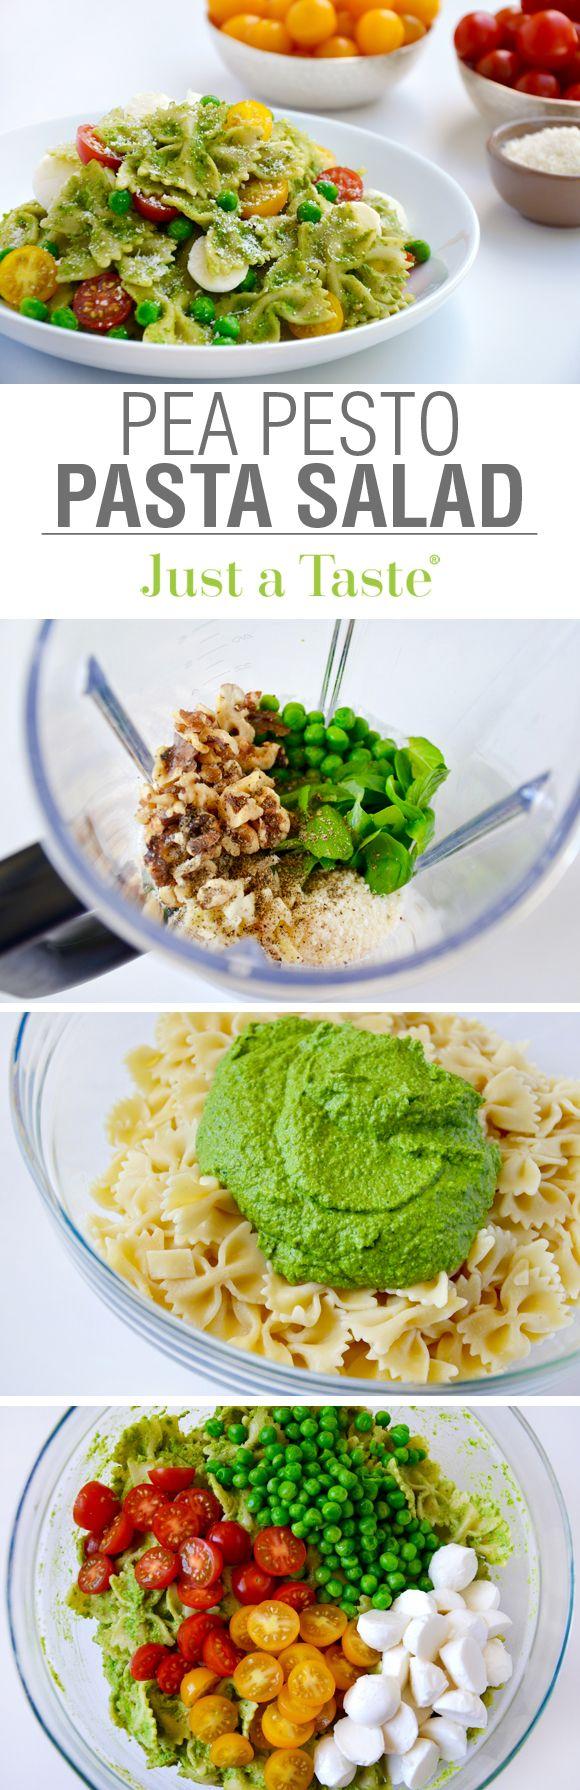 Pea Pesto Pasta Salad recipe via justataste.com